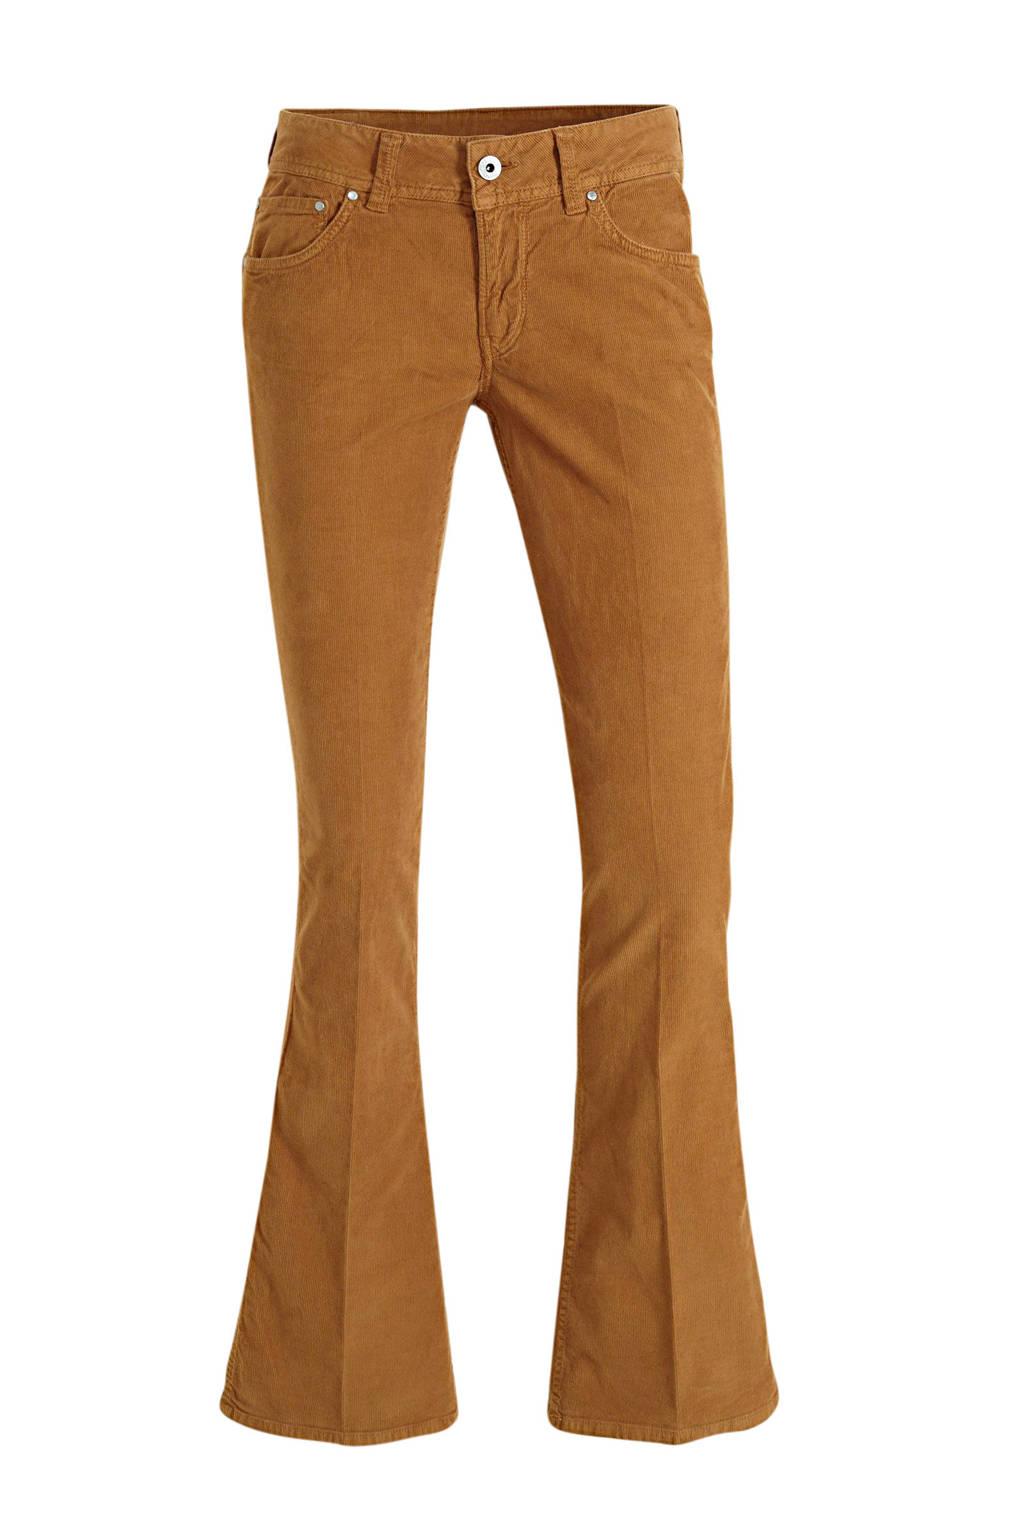 Pepe Jeans corduroy broek NEW PIMLICO goldenochre142, GOLDENOCHRE142